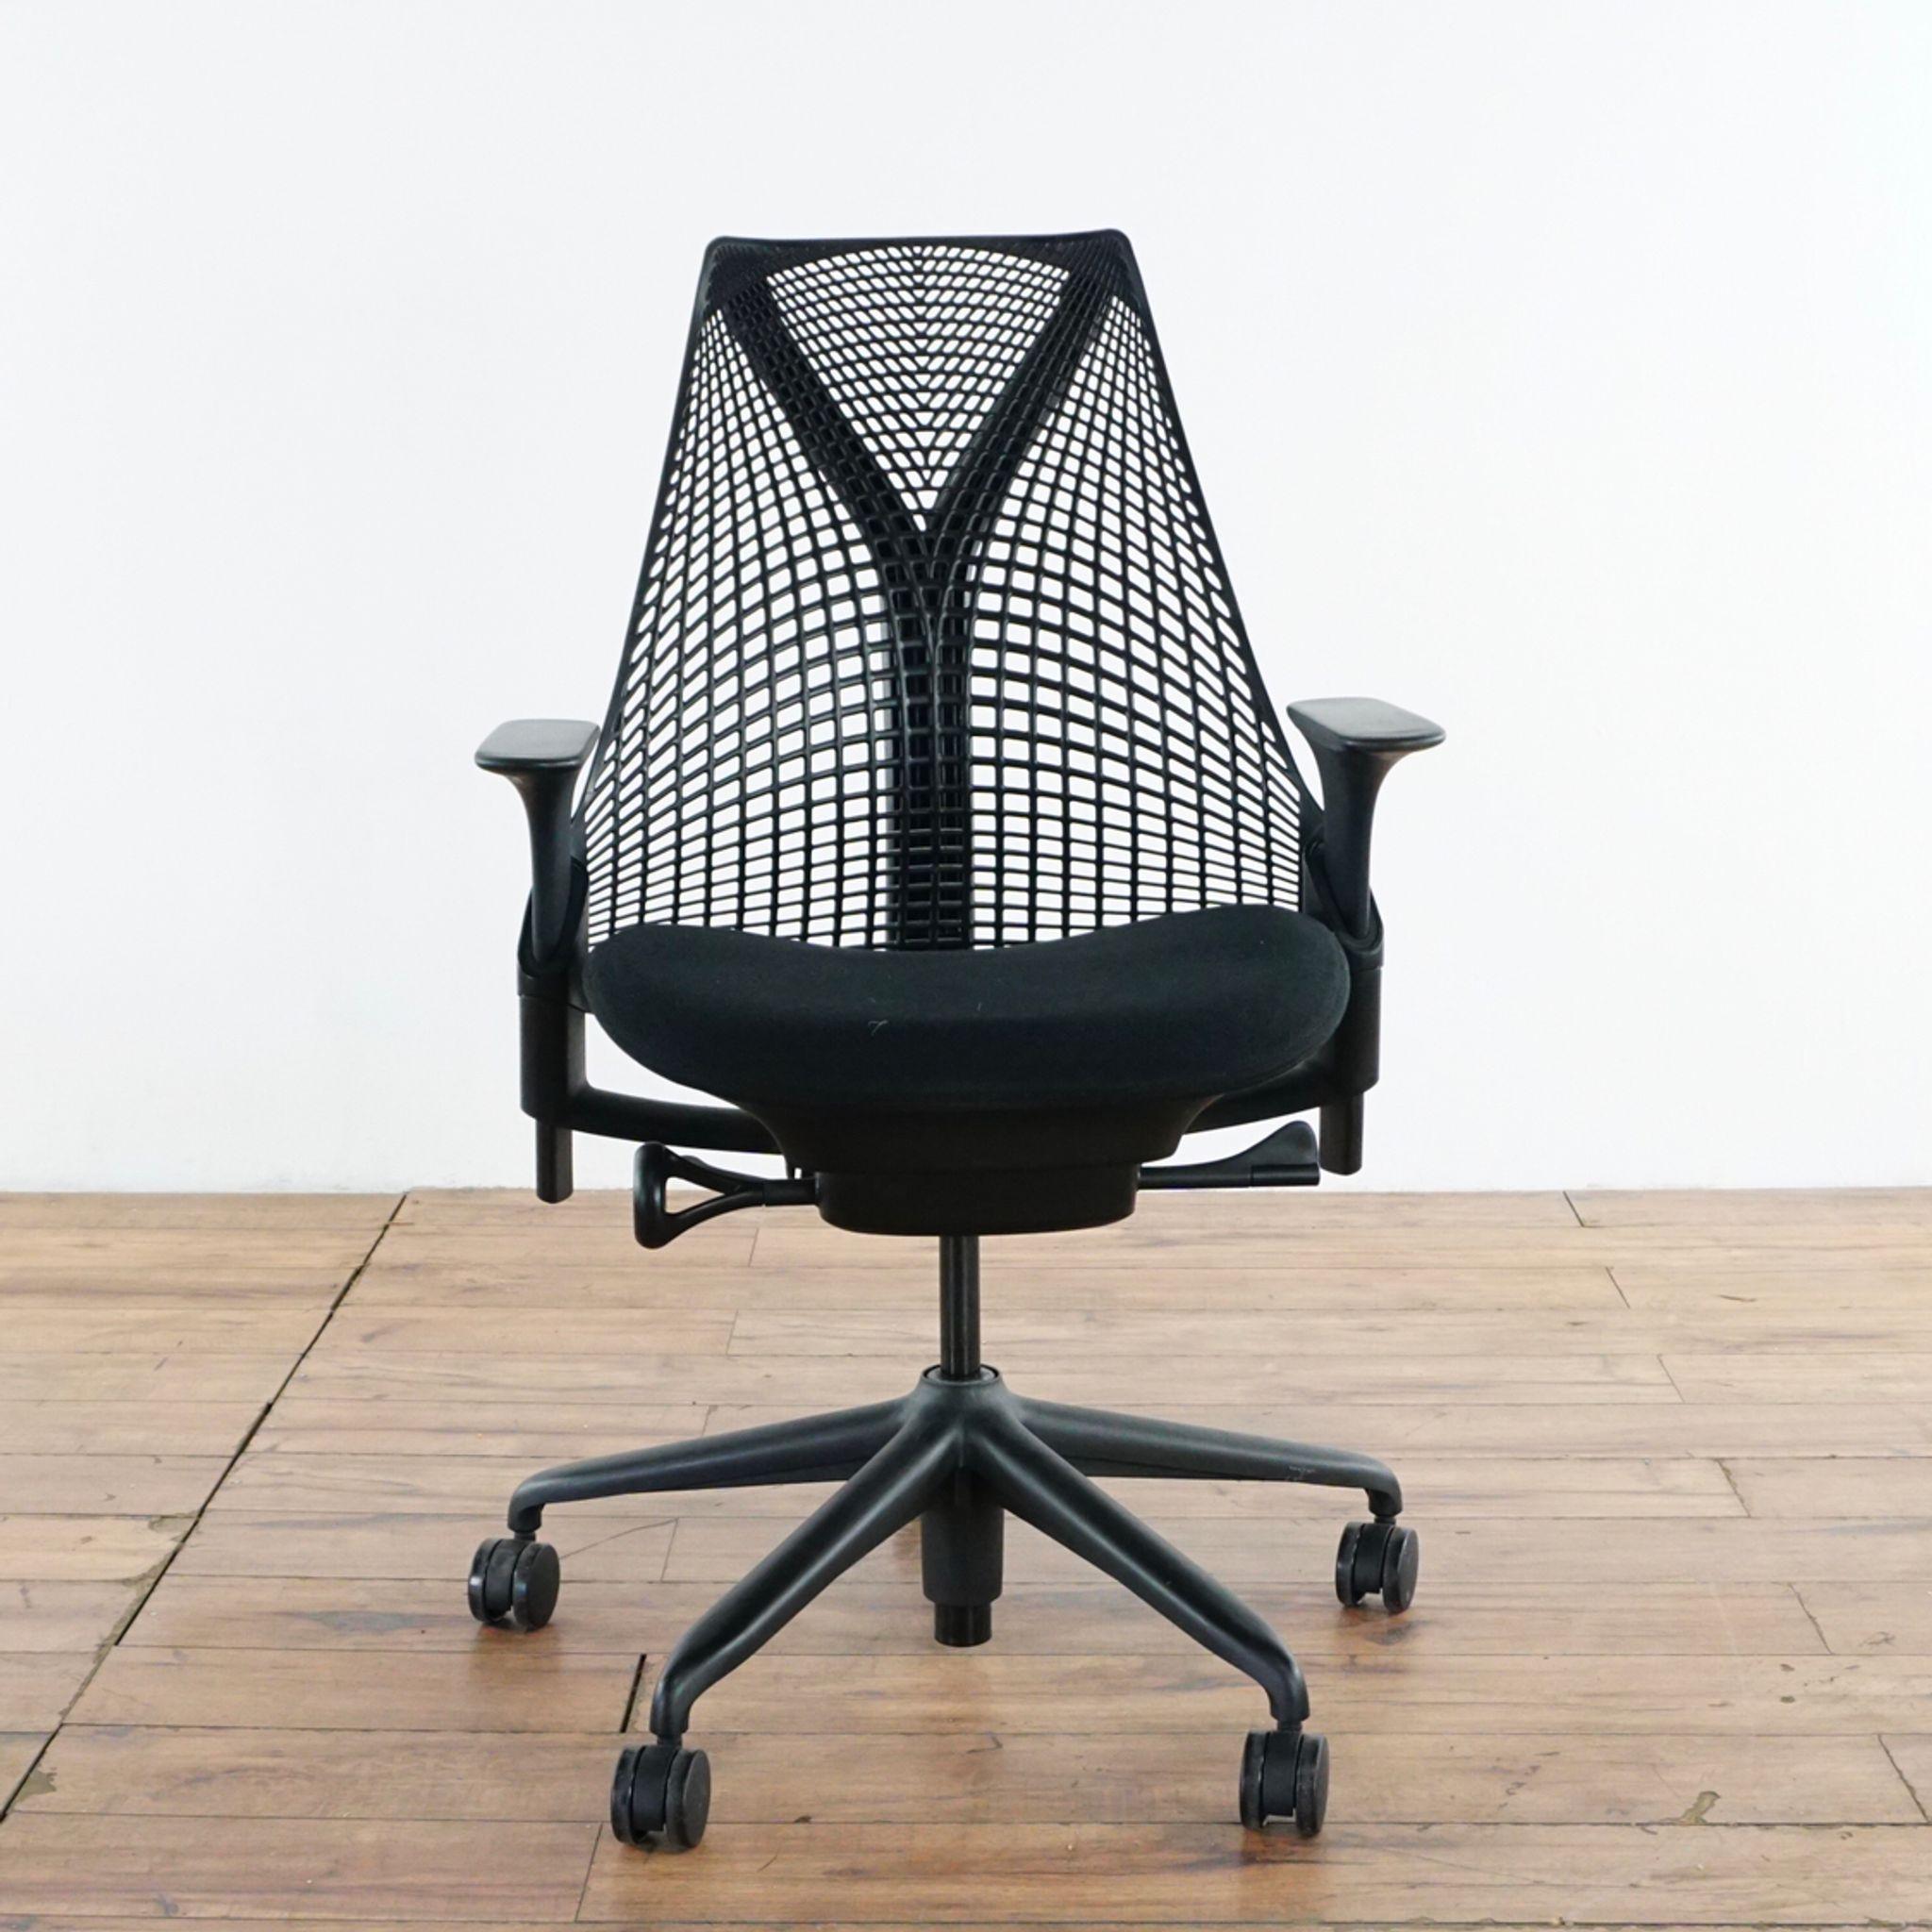 Herman Miller Sayl Ergonomic Office Chair Ergonomic